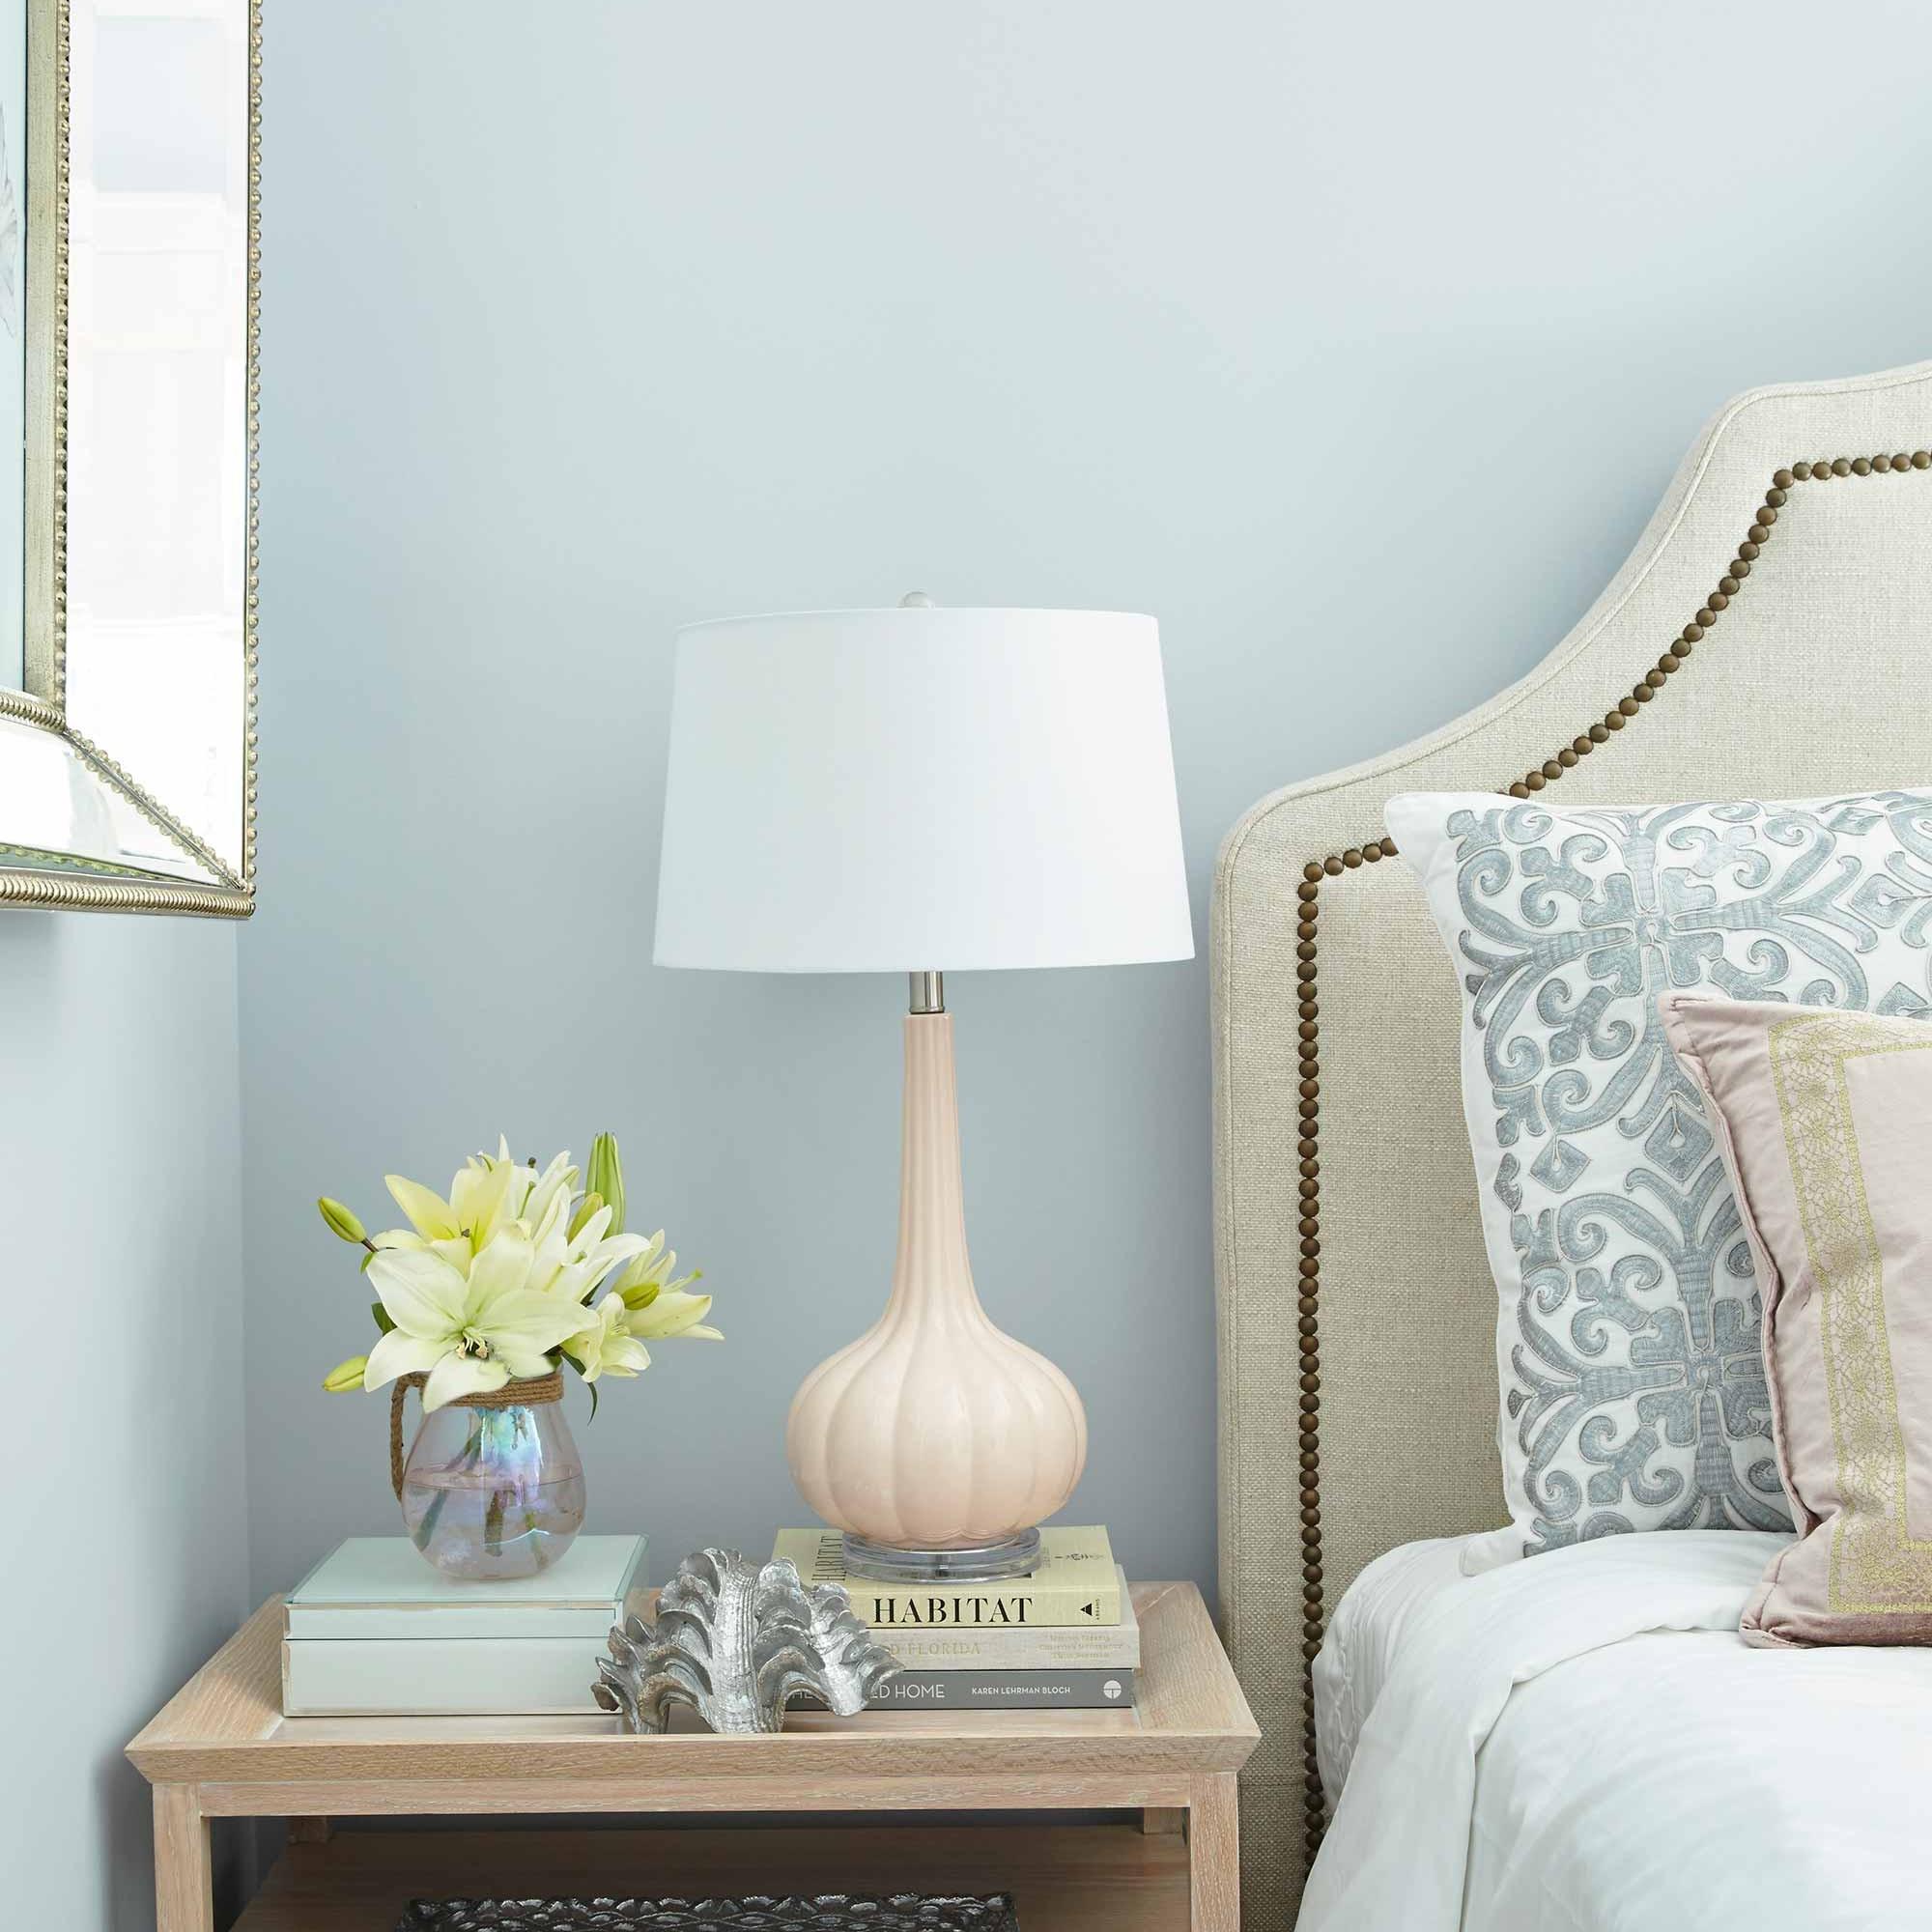 Guestroom interior design by NYC's interior design firm Darci Hether New York